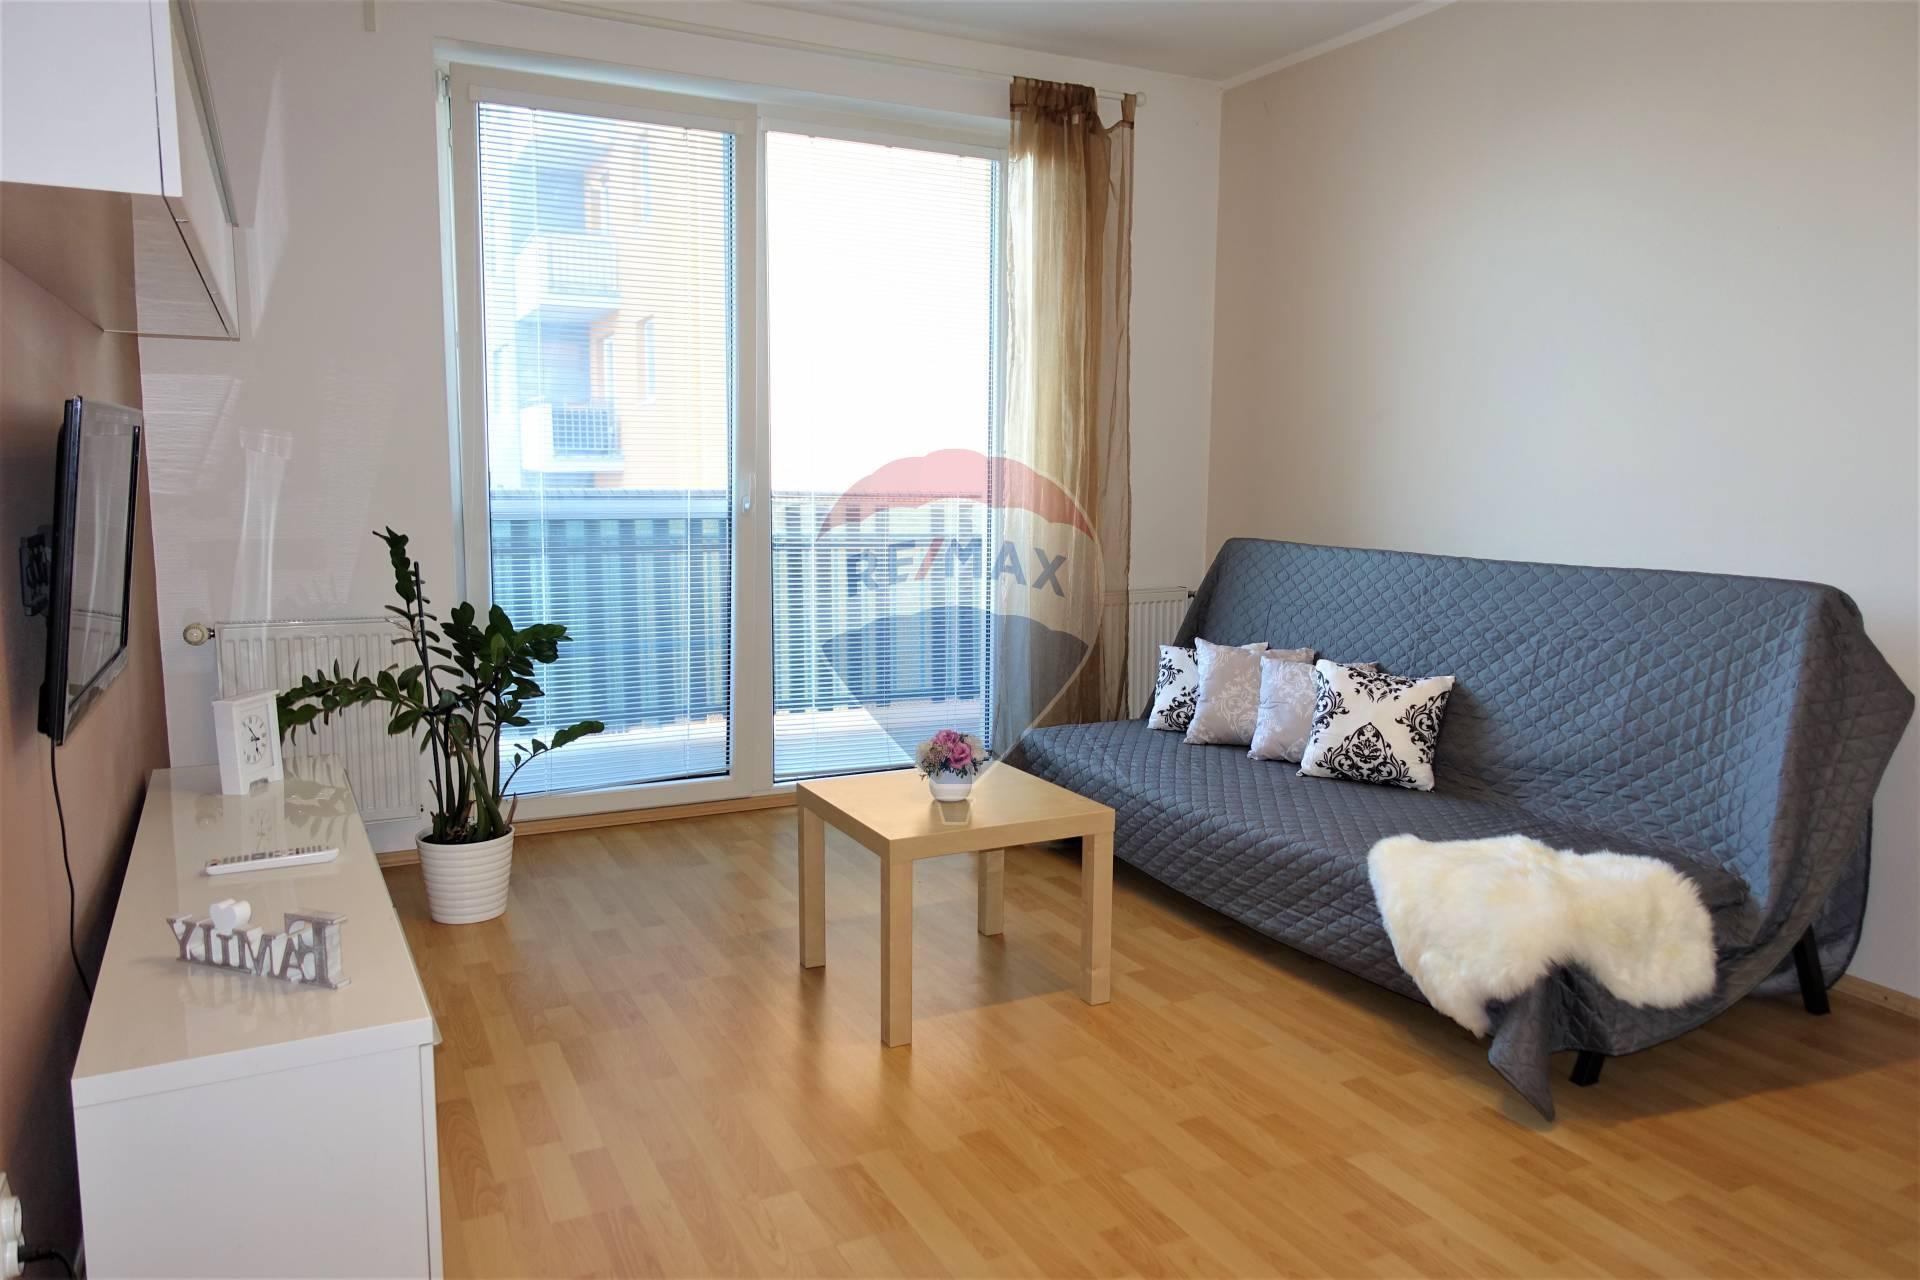 Predaj 1 izb. bytu v Senci, Pezinská ul., balkón